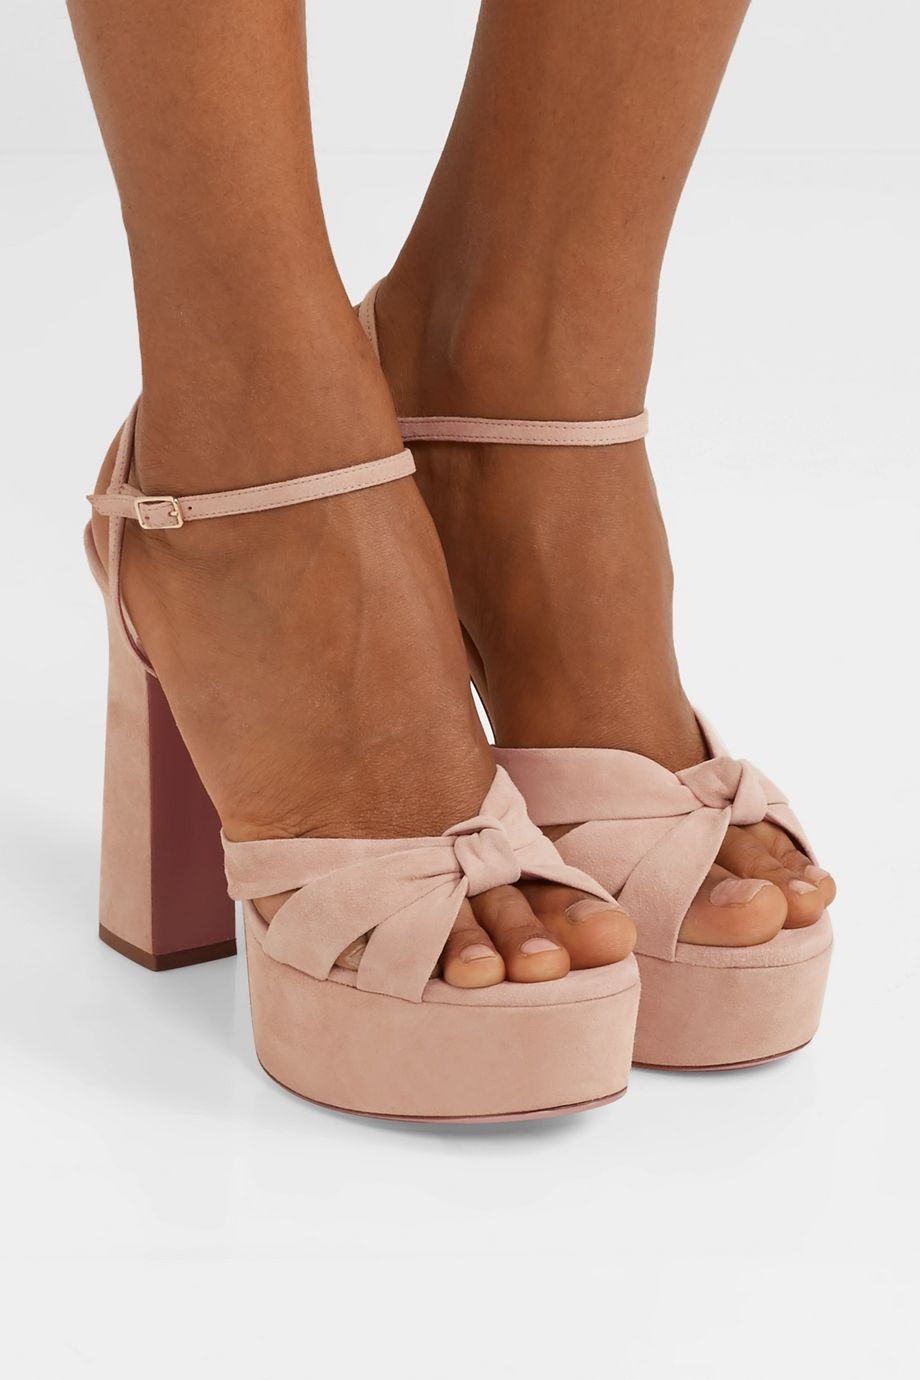 Aquazzura Baba Plateau 125 suede platform sandals